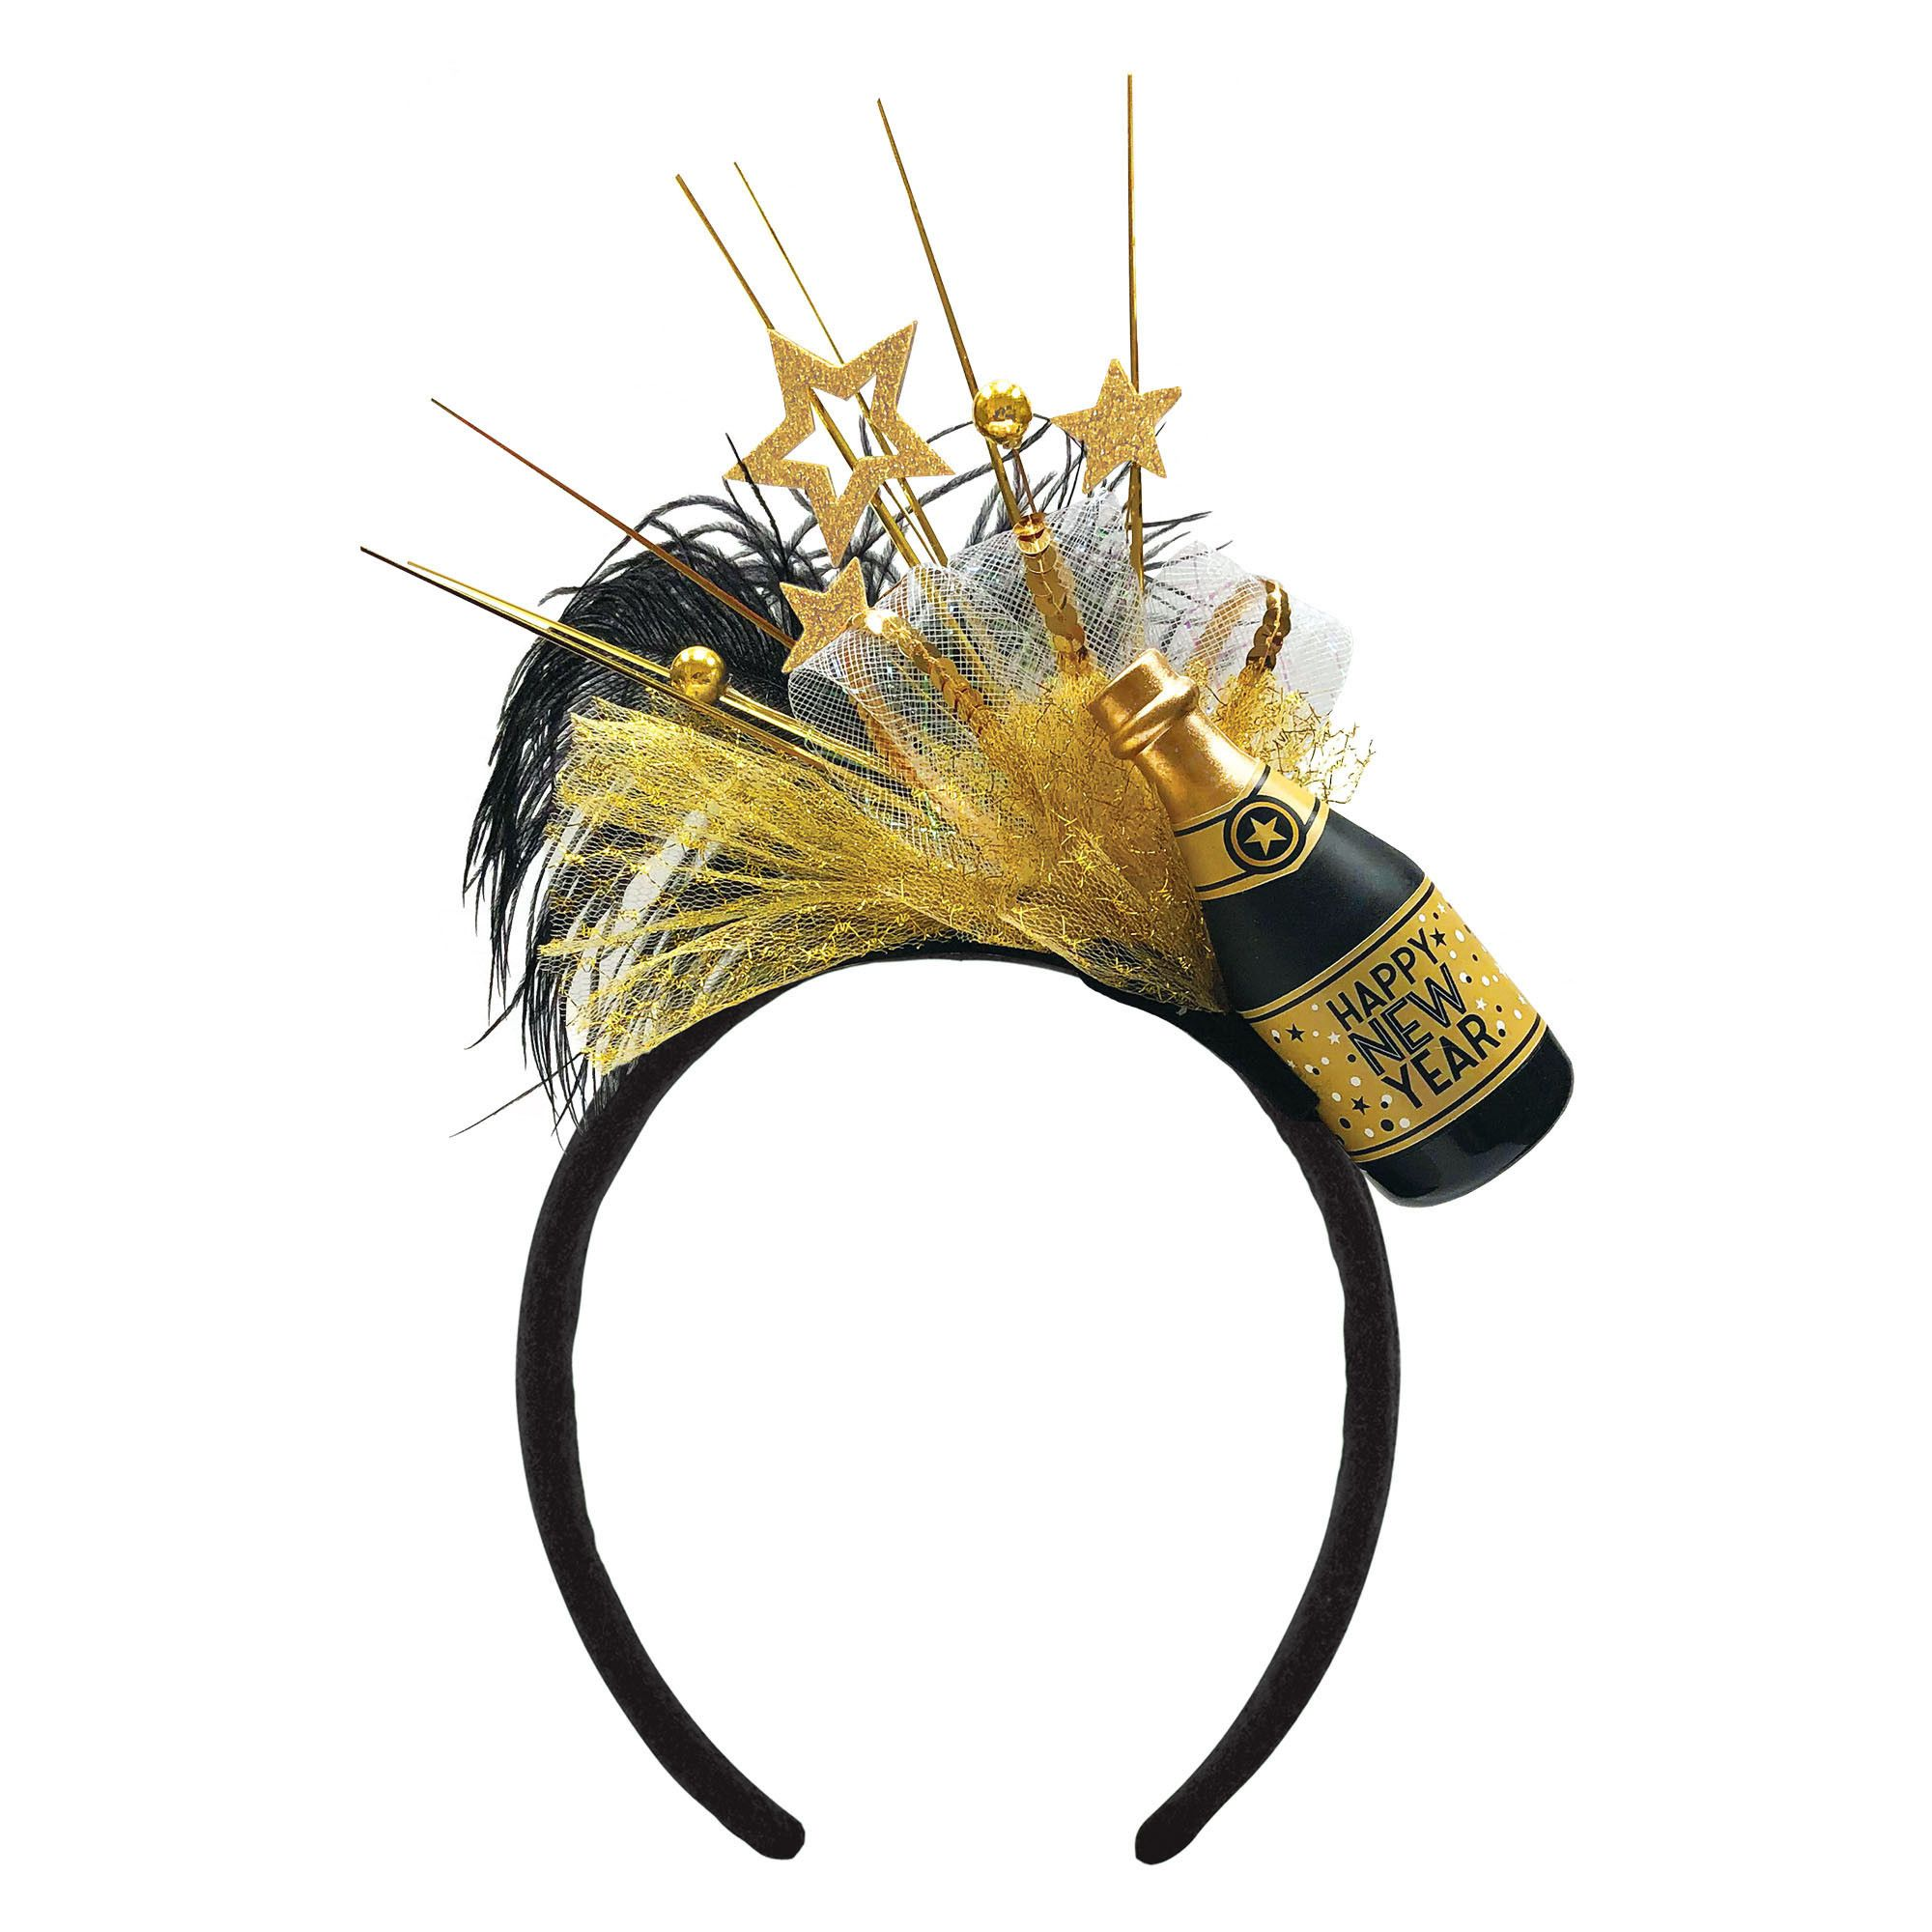 Champagne Bottle Dlx Headband